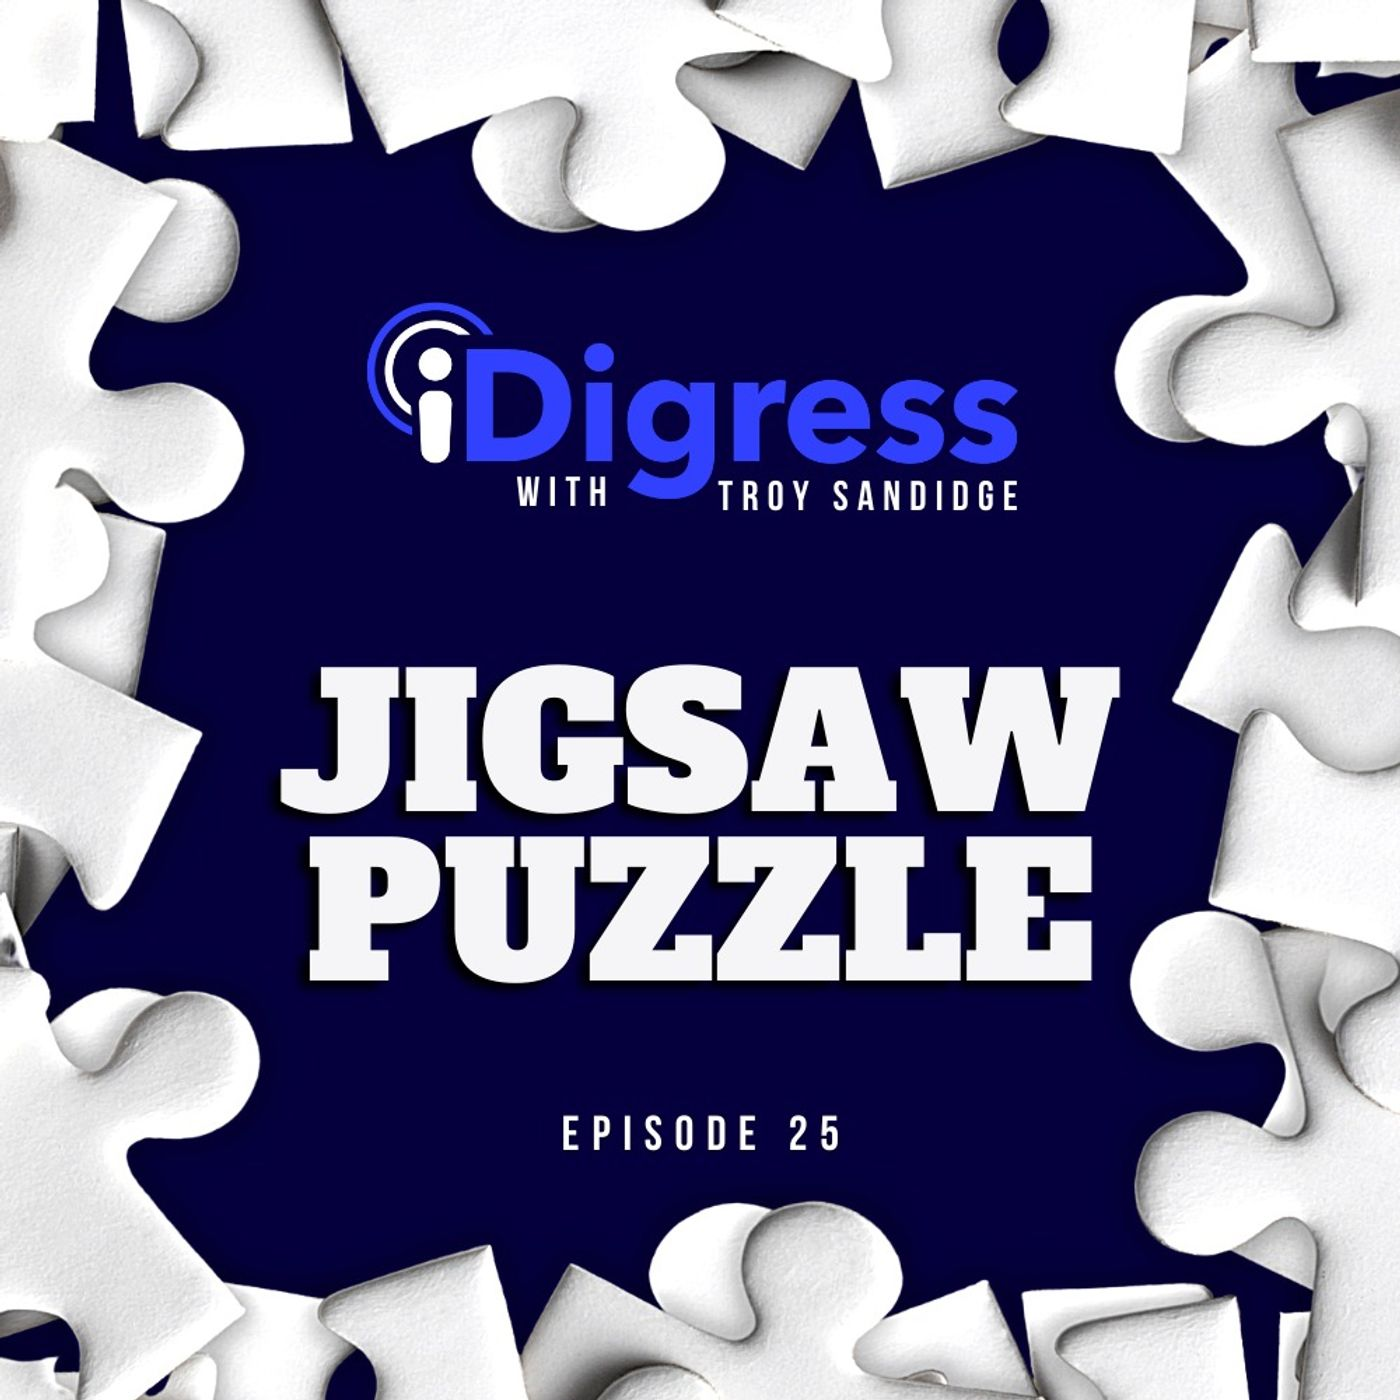 #JigsawPuzzle